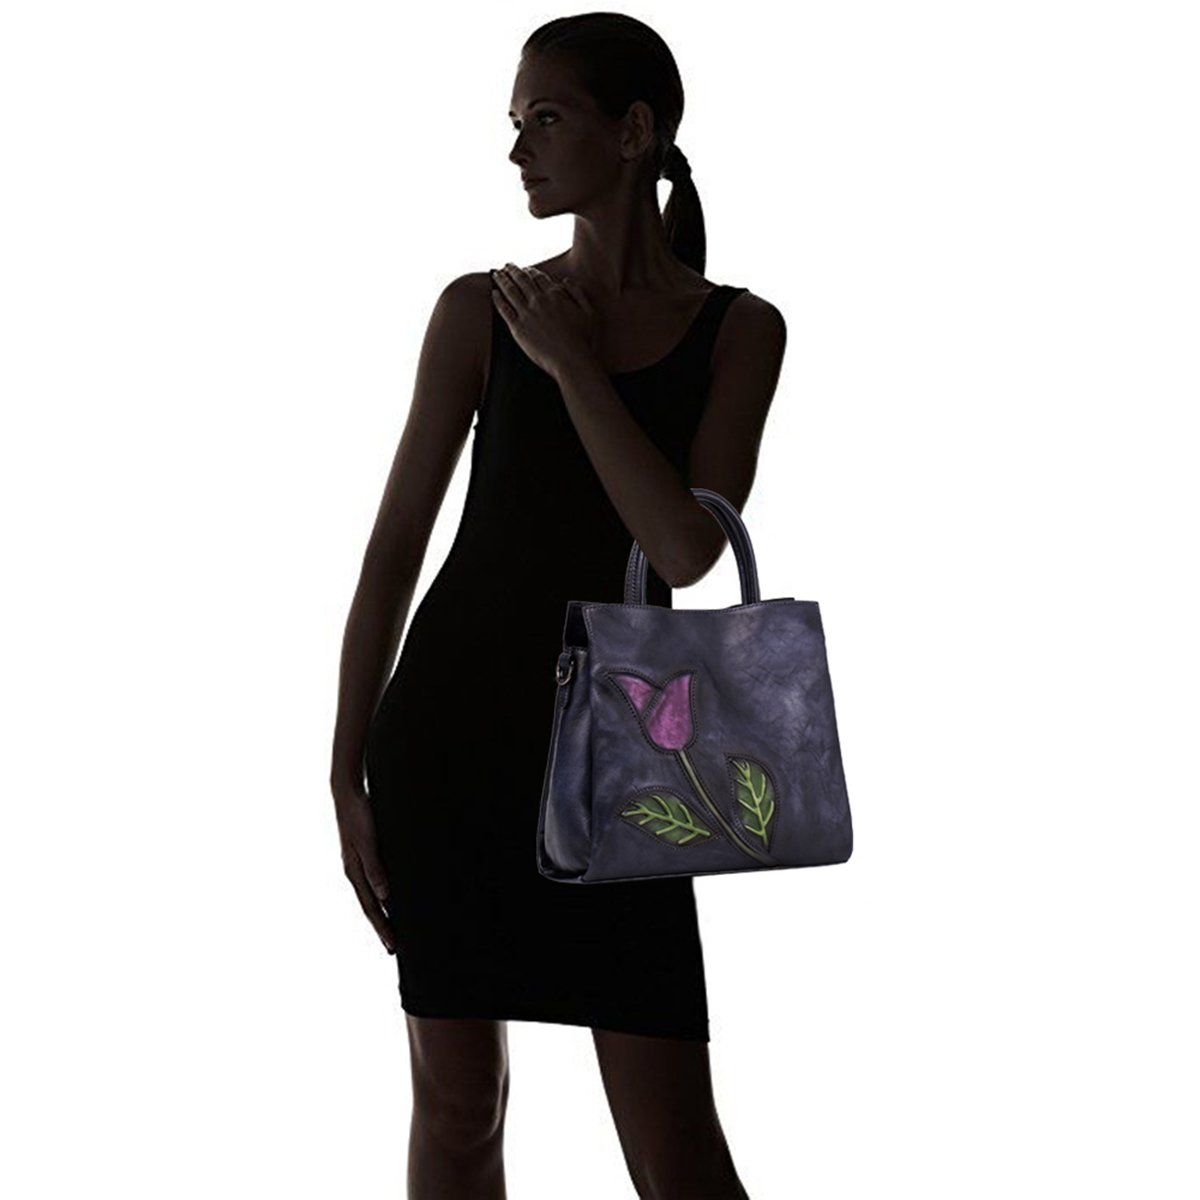 Aphison Designer Soft Leather Totes Handbags for Women, Ladies Satchels Shoulder Bags (BLACK) by APHISON (Image #7)